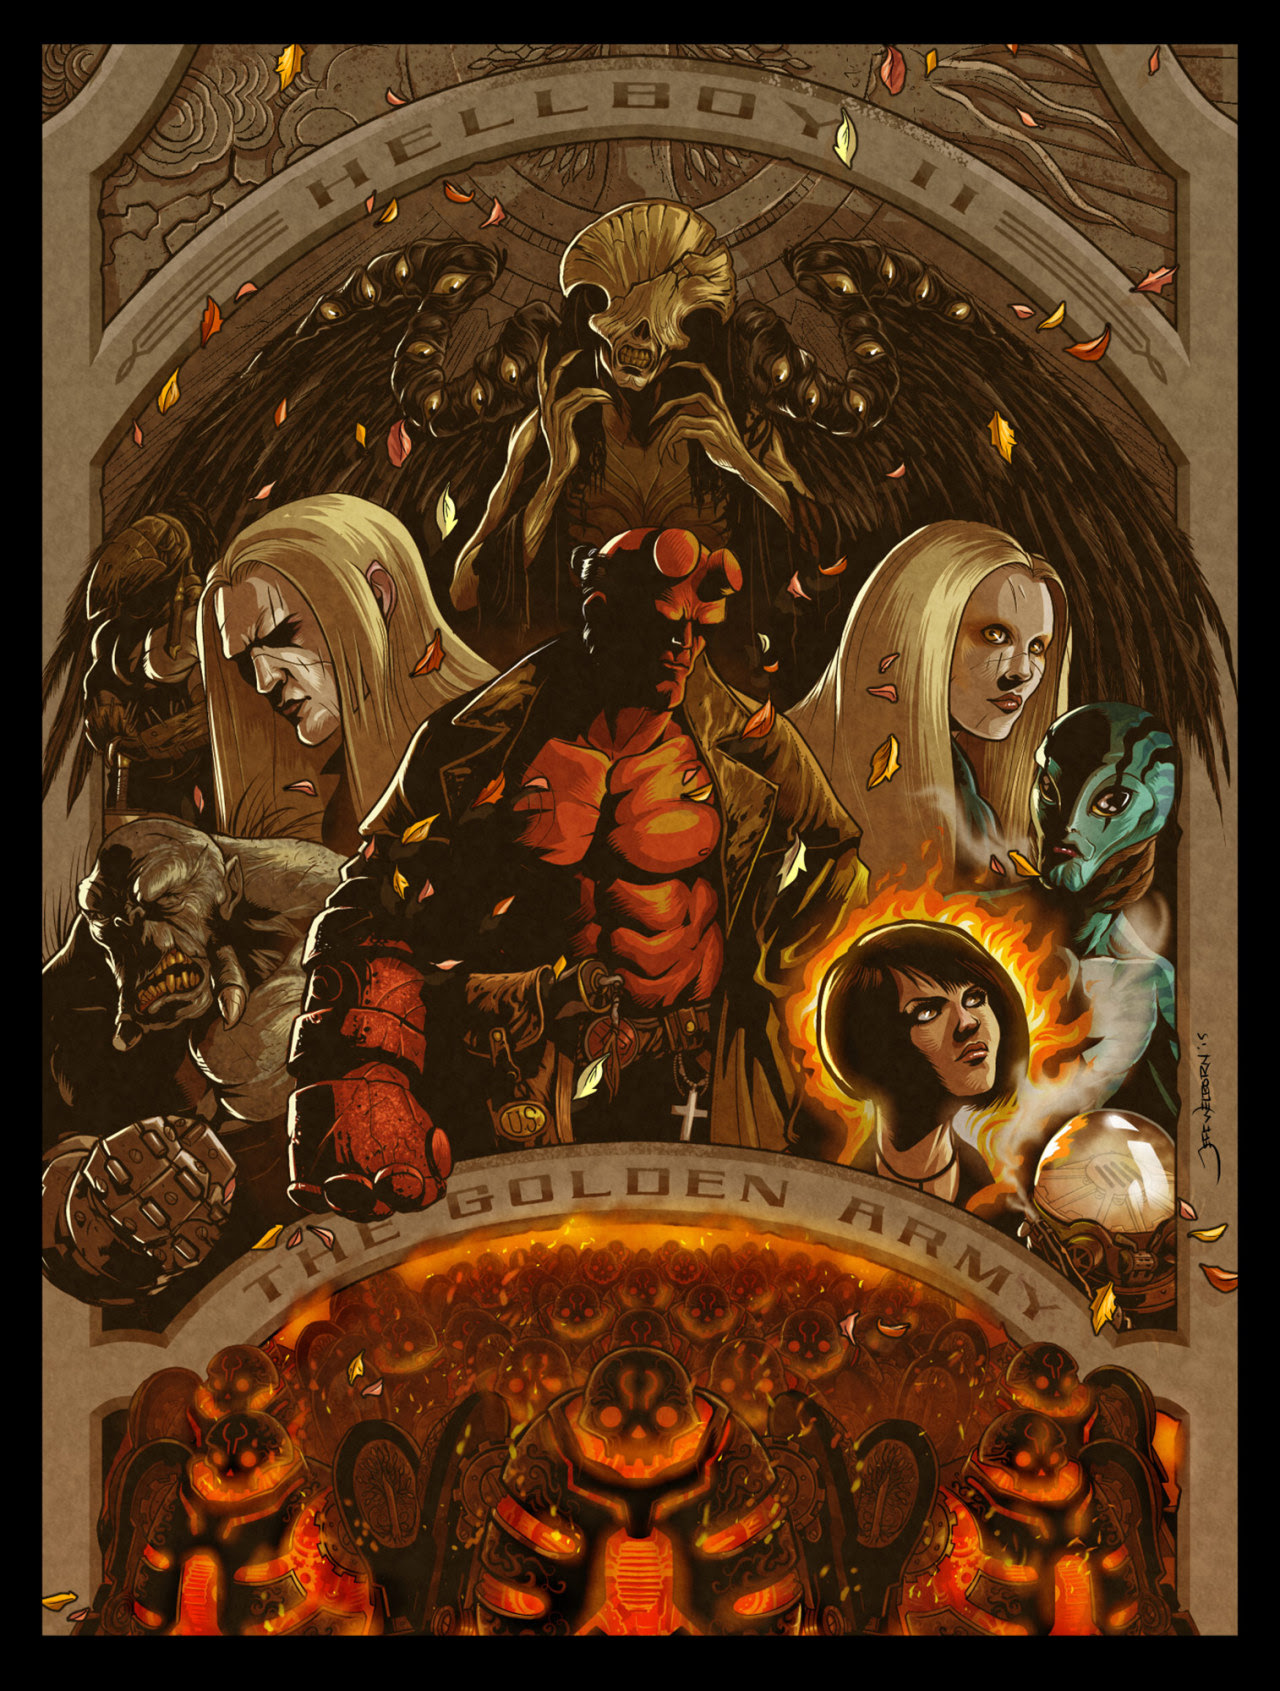 Hellboy II The Golden Armyby Jeff Welborn